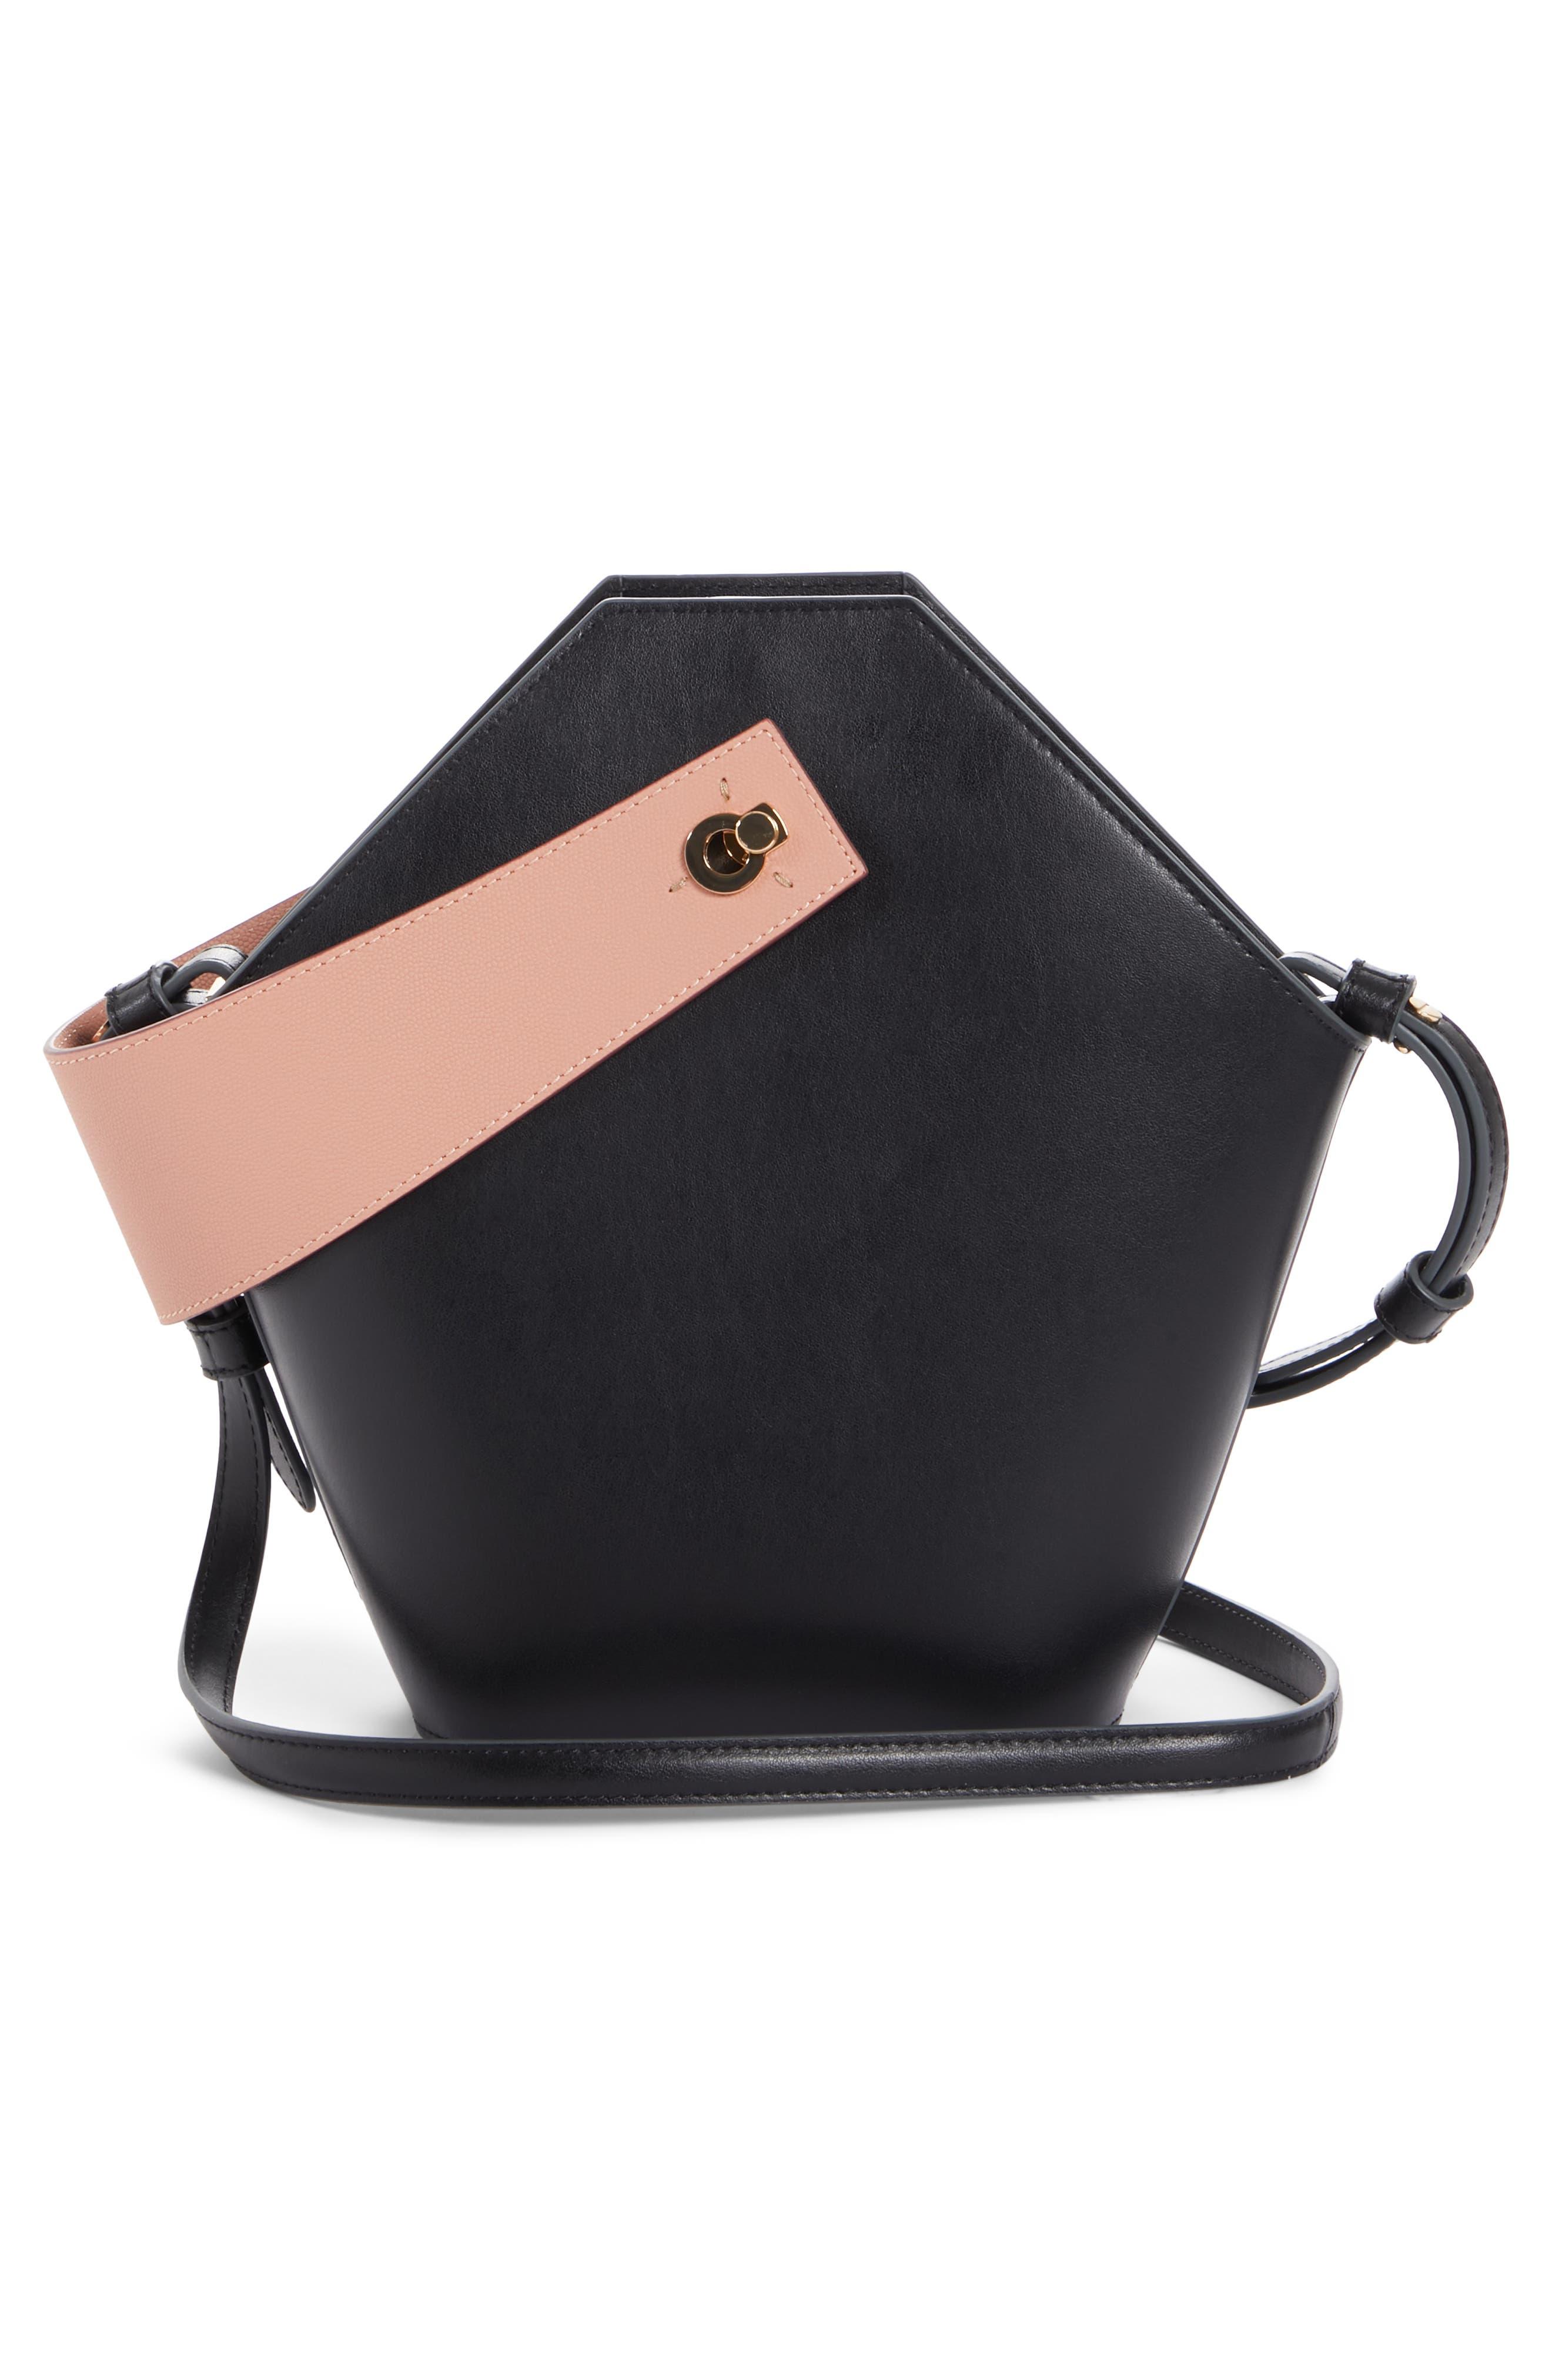 Johnny Leather Bucket Bag,                             Alternate thumbnail 3, color,                             BLACK/ BLUSH